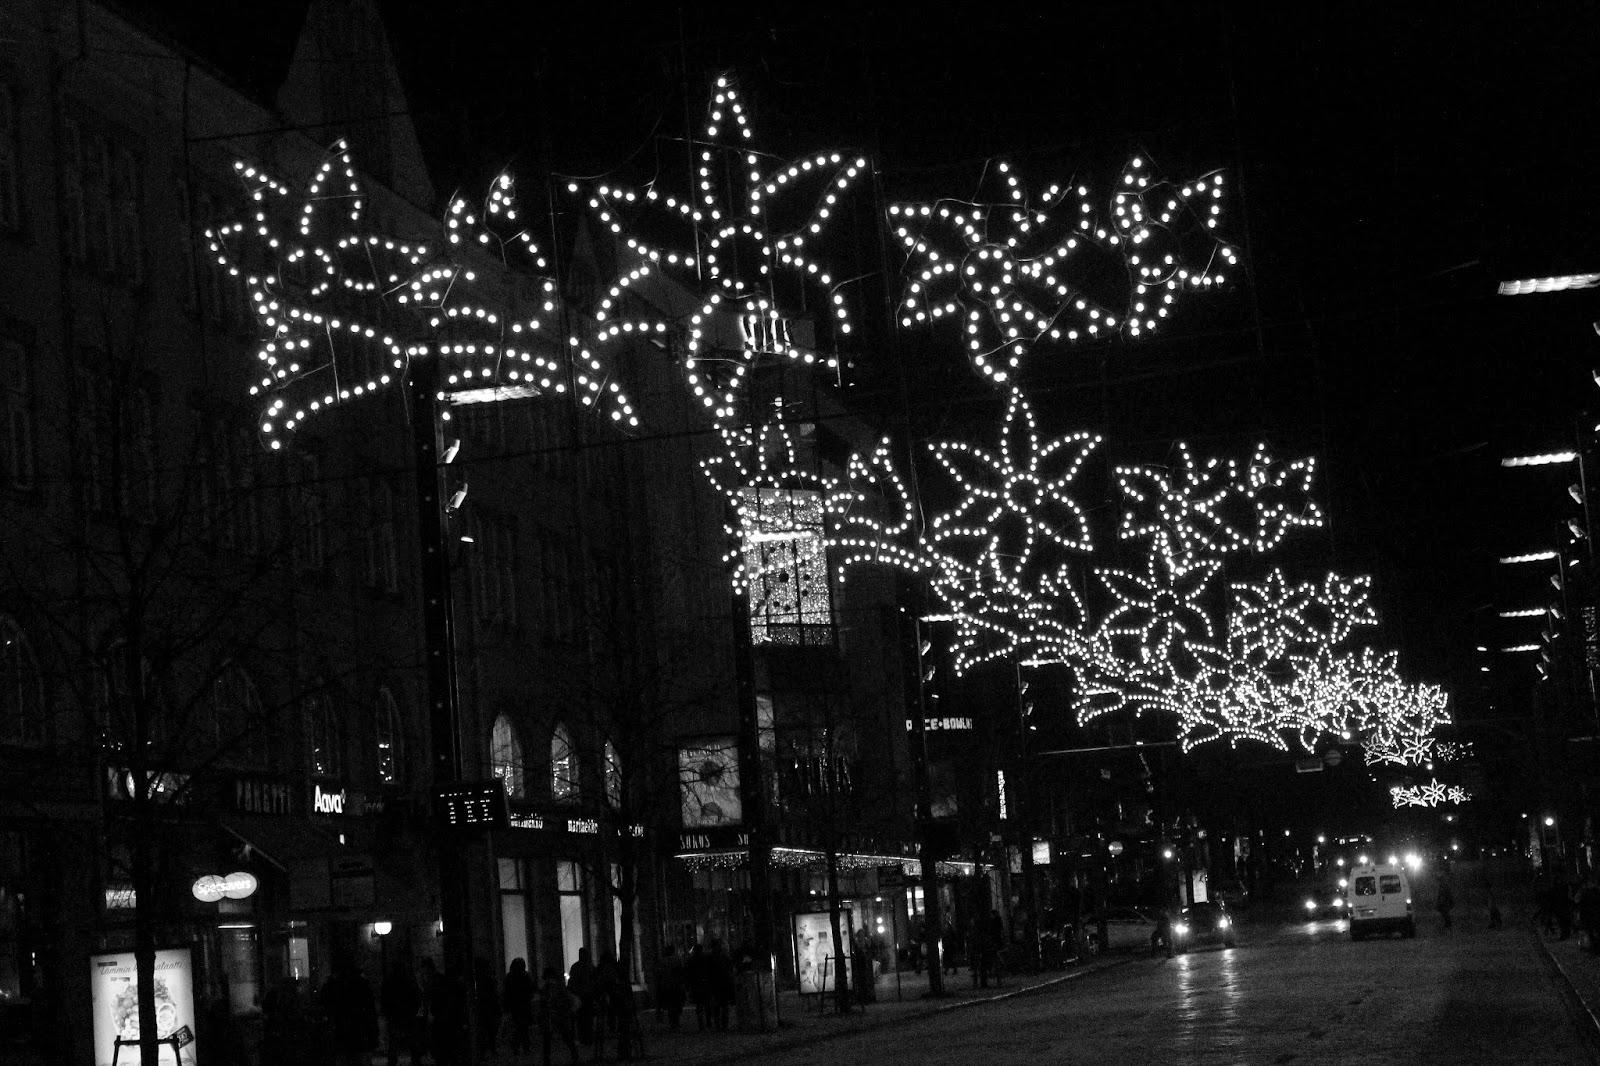 Valoviikot Tampere